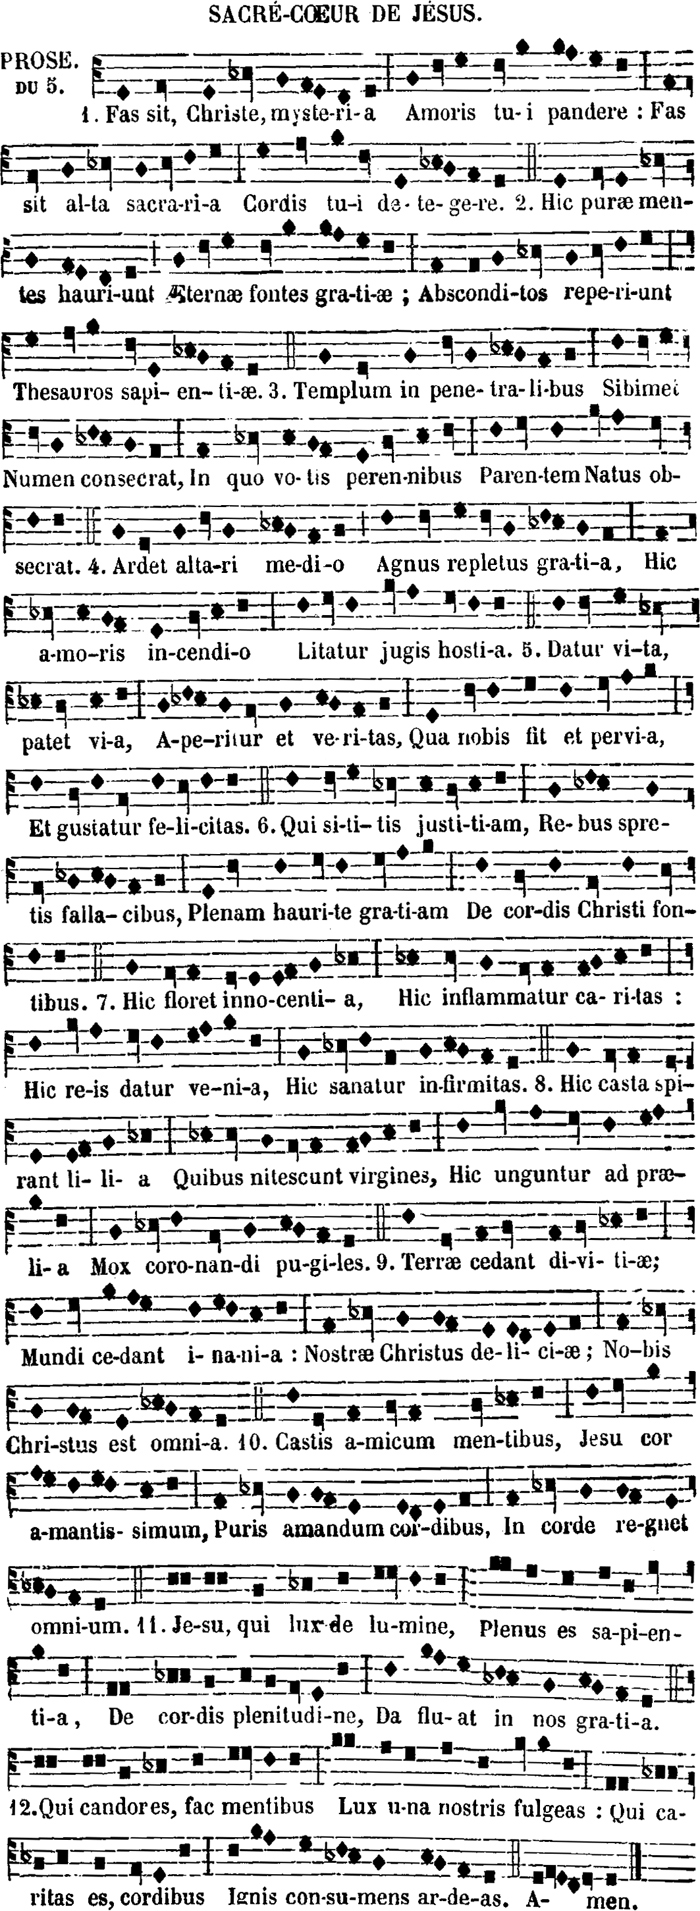 Prose du Sacre Coeur